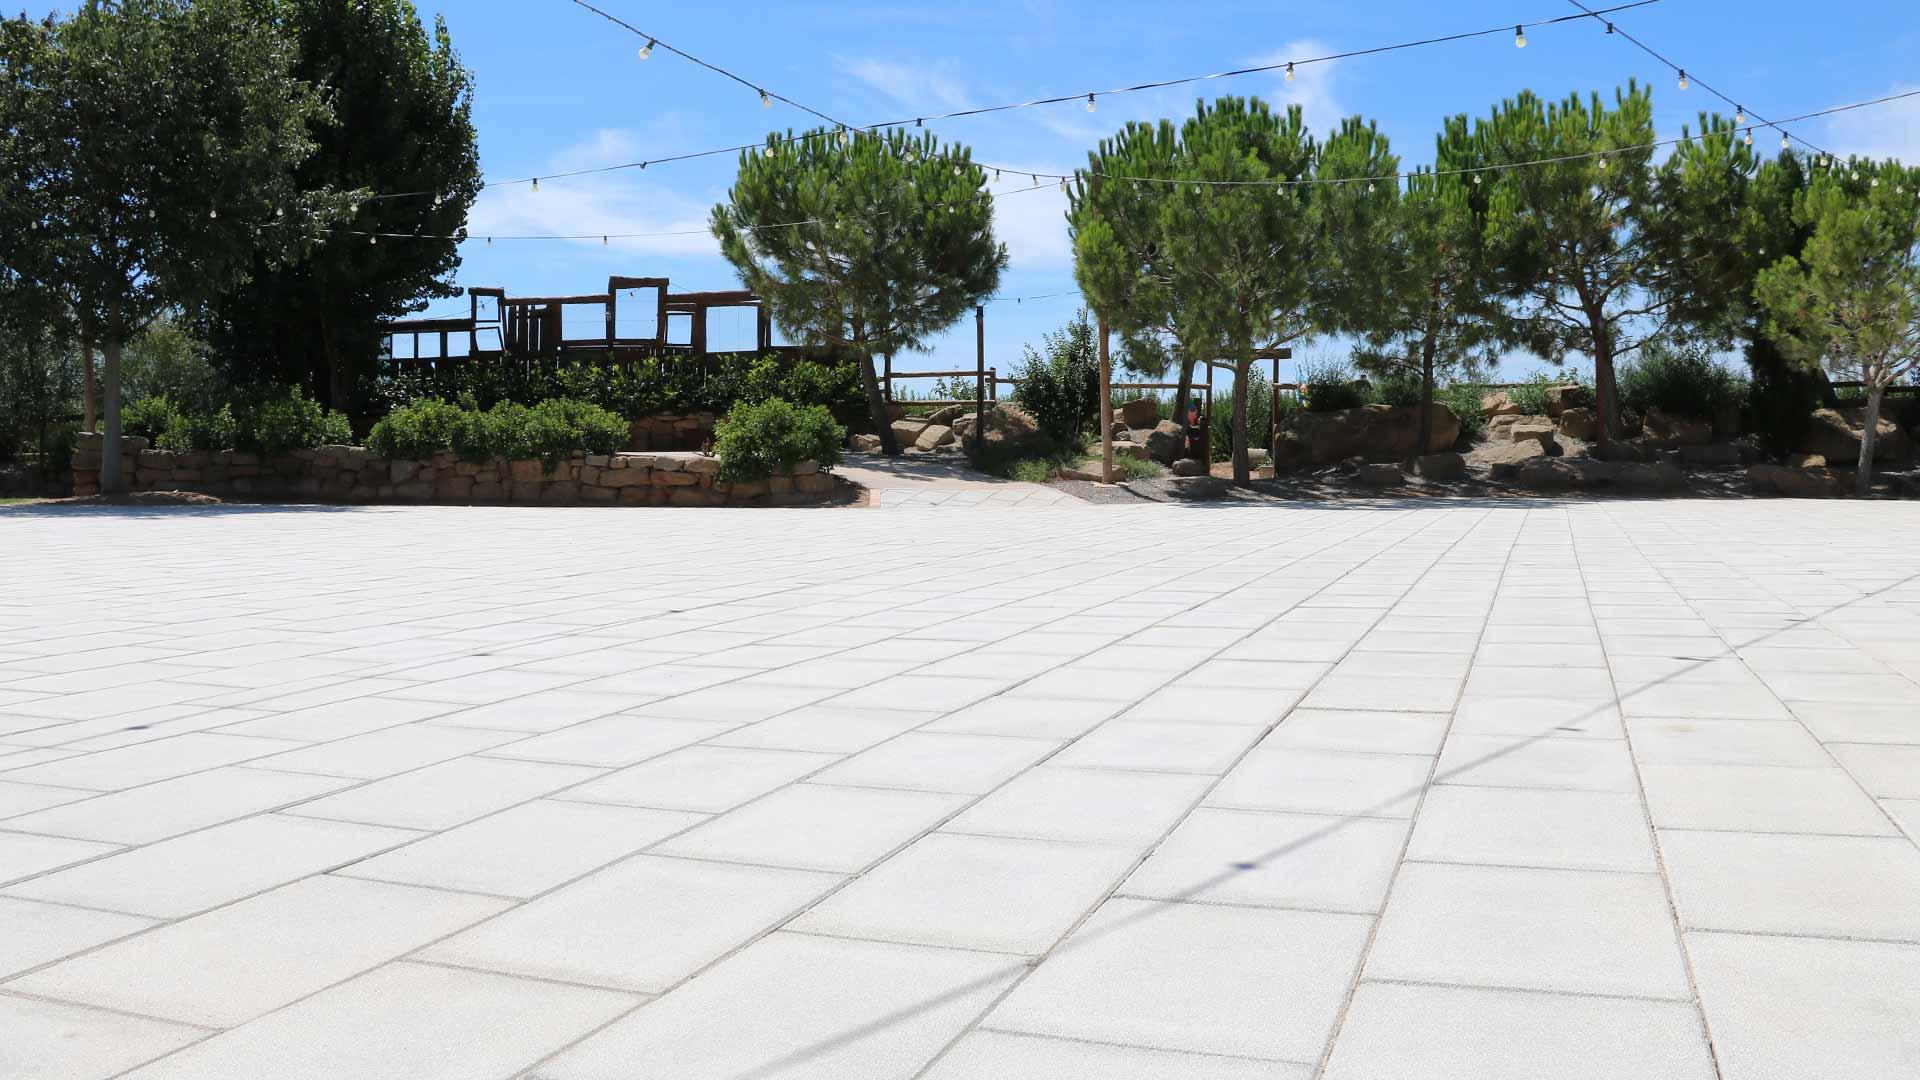 pujol-paviments-terratzo-exterior-masia-6